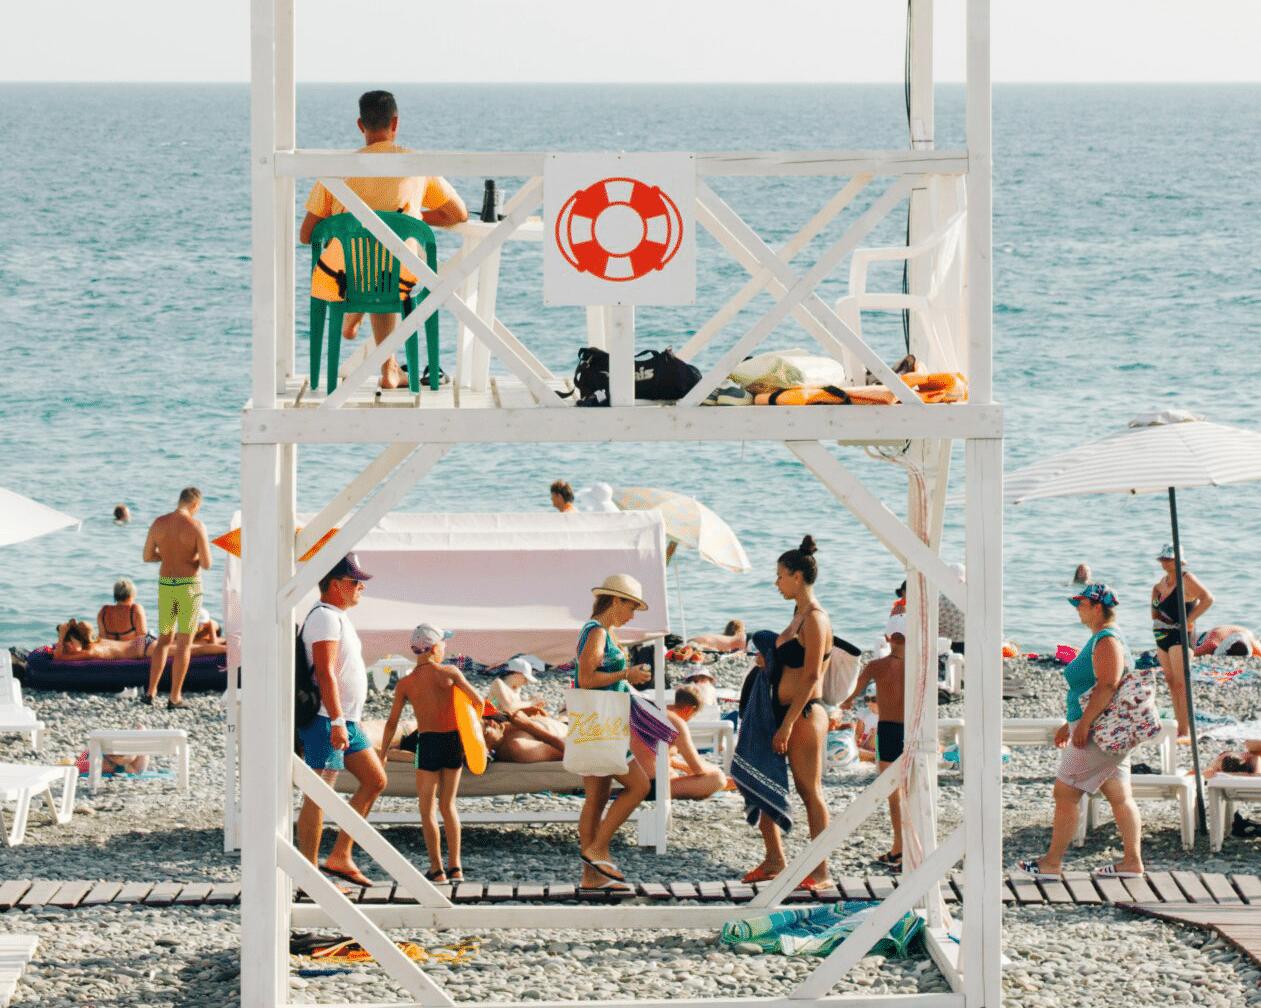 Lifeguard overseeing the beach